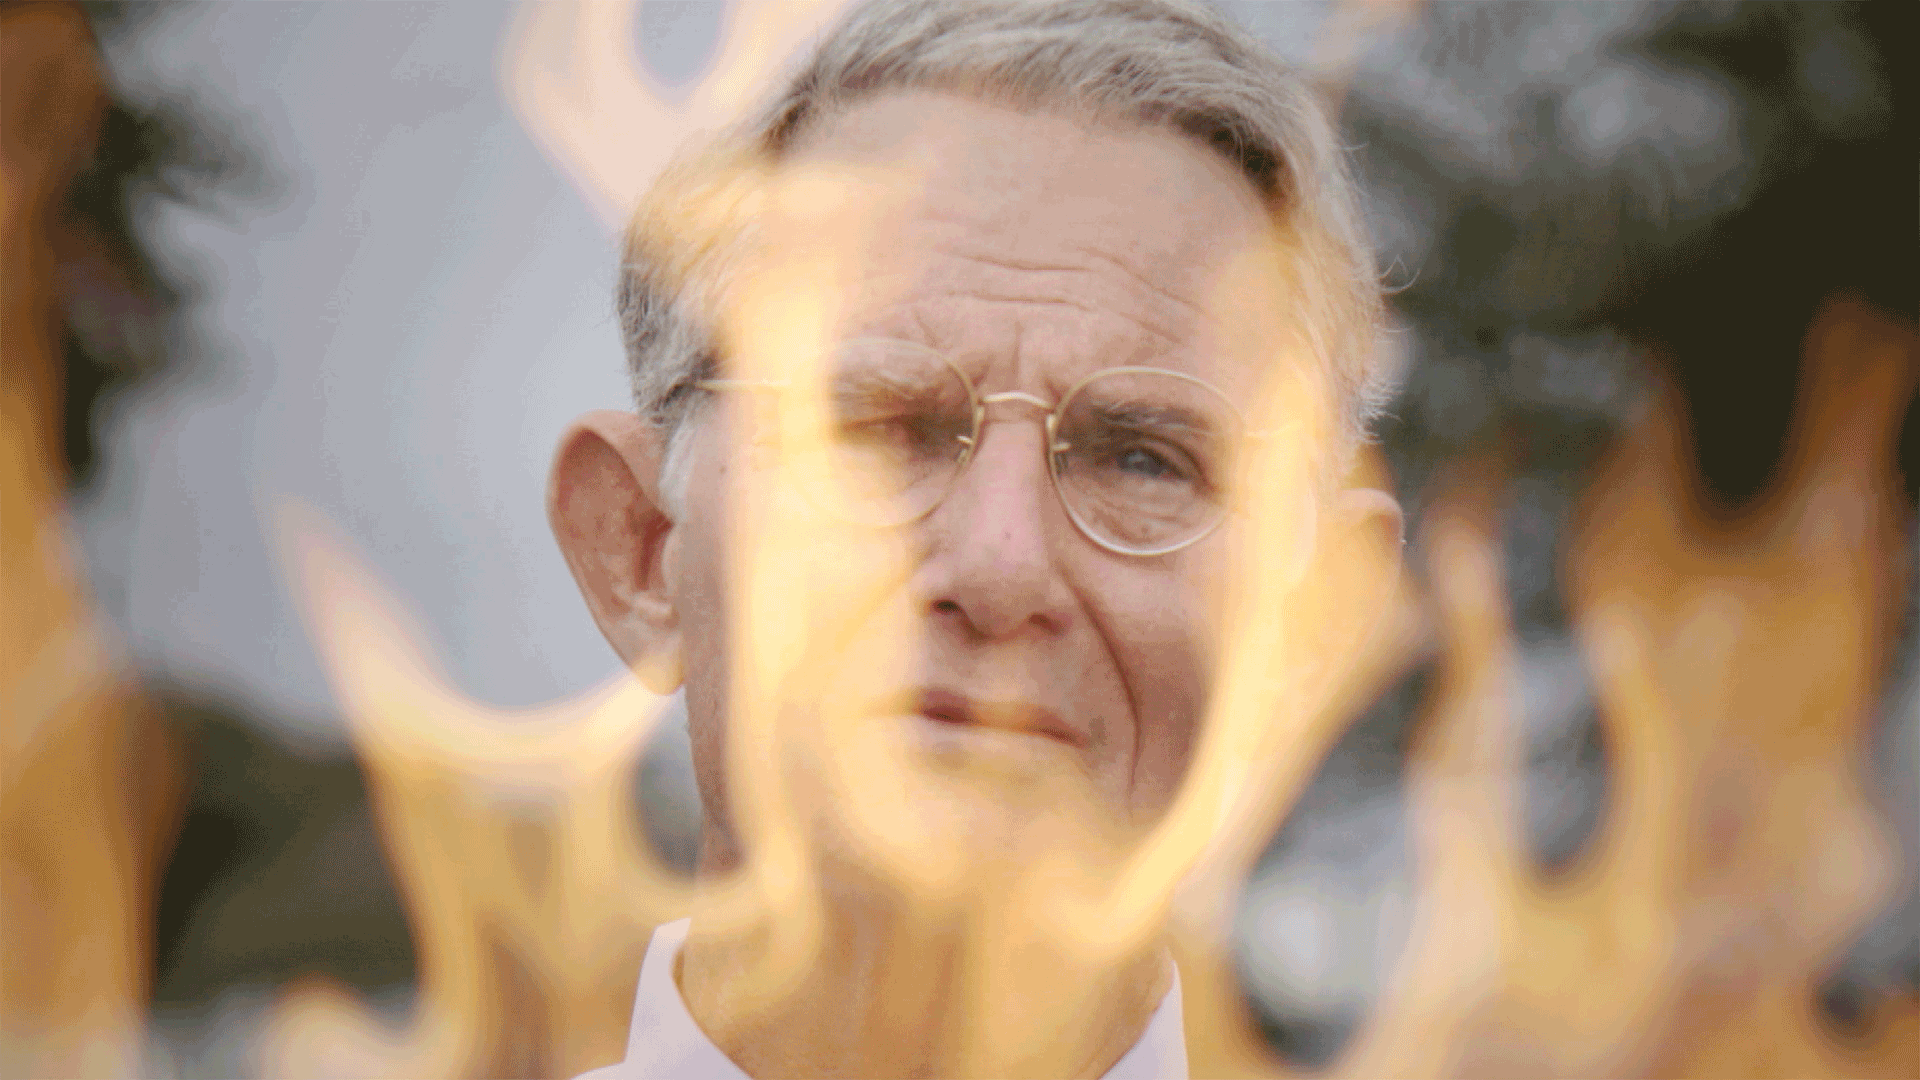 Man on Fire - Trailer